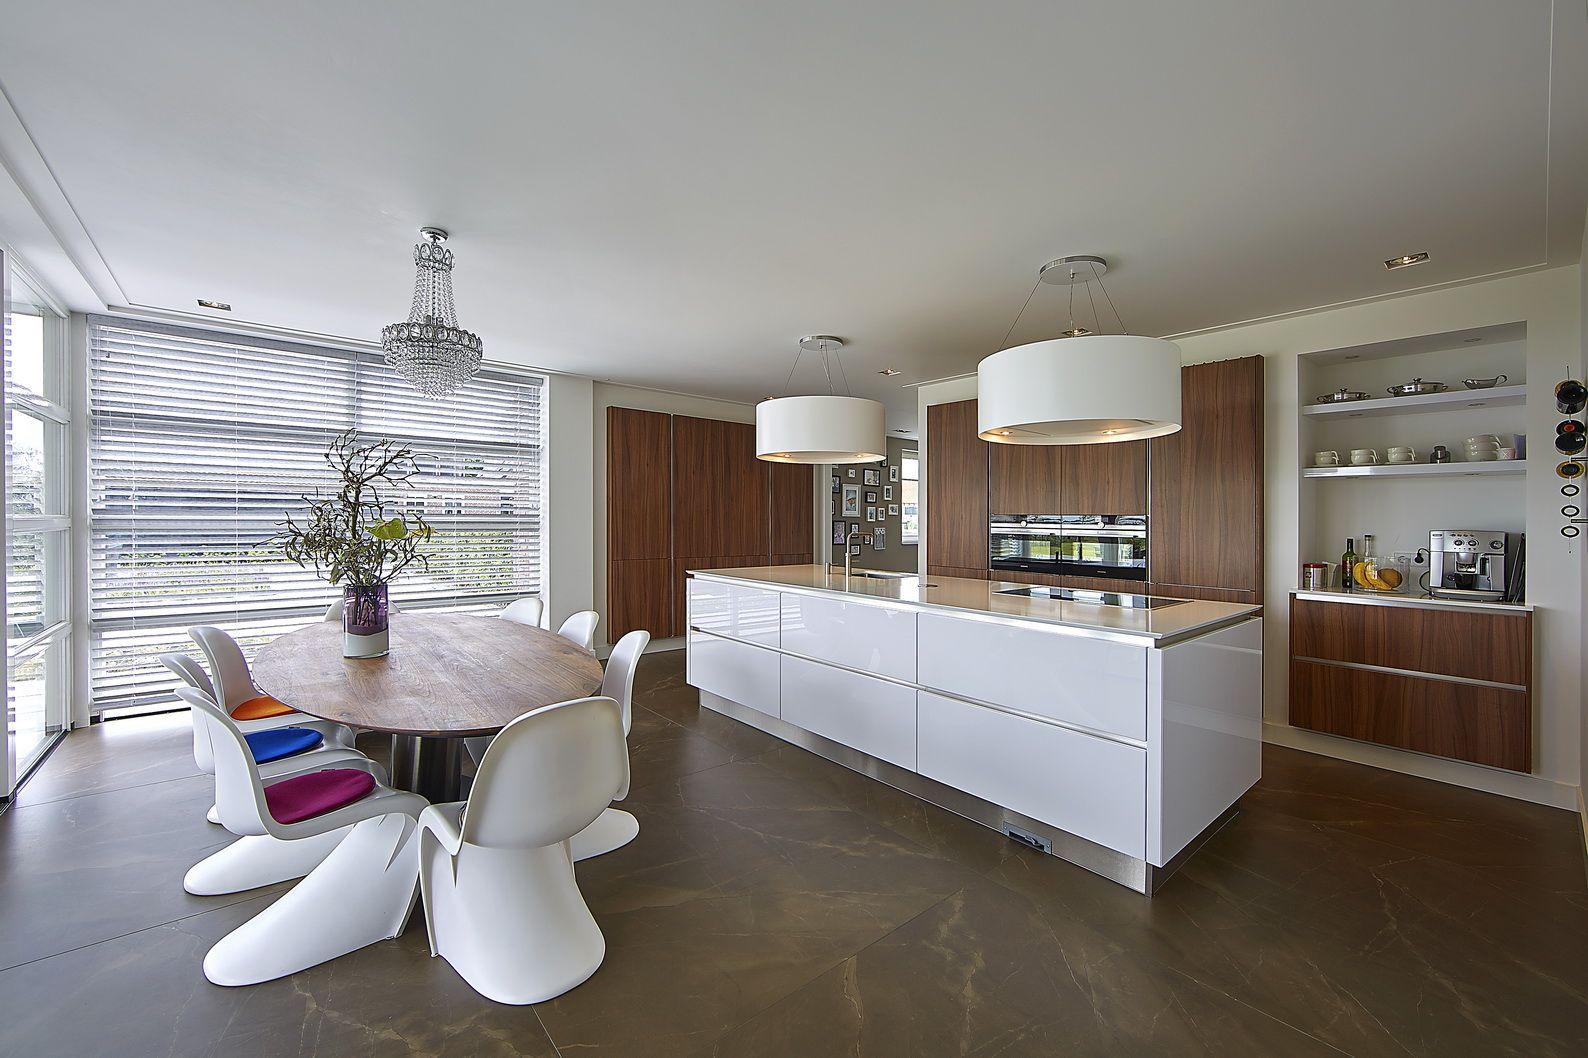 Keuken modern kookeiland eetkamer serre brand bba i bba